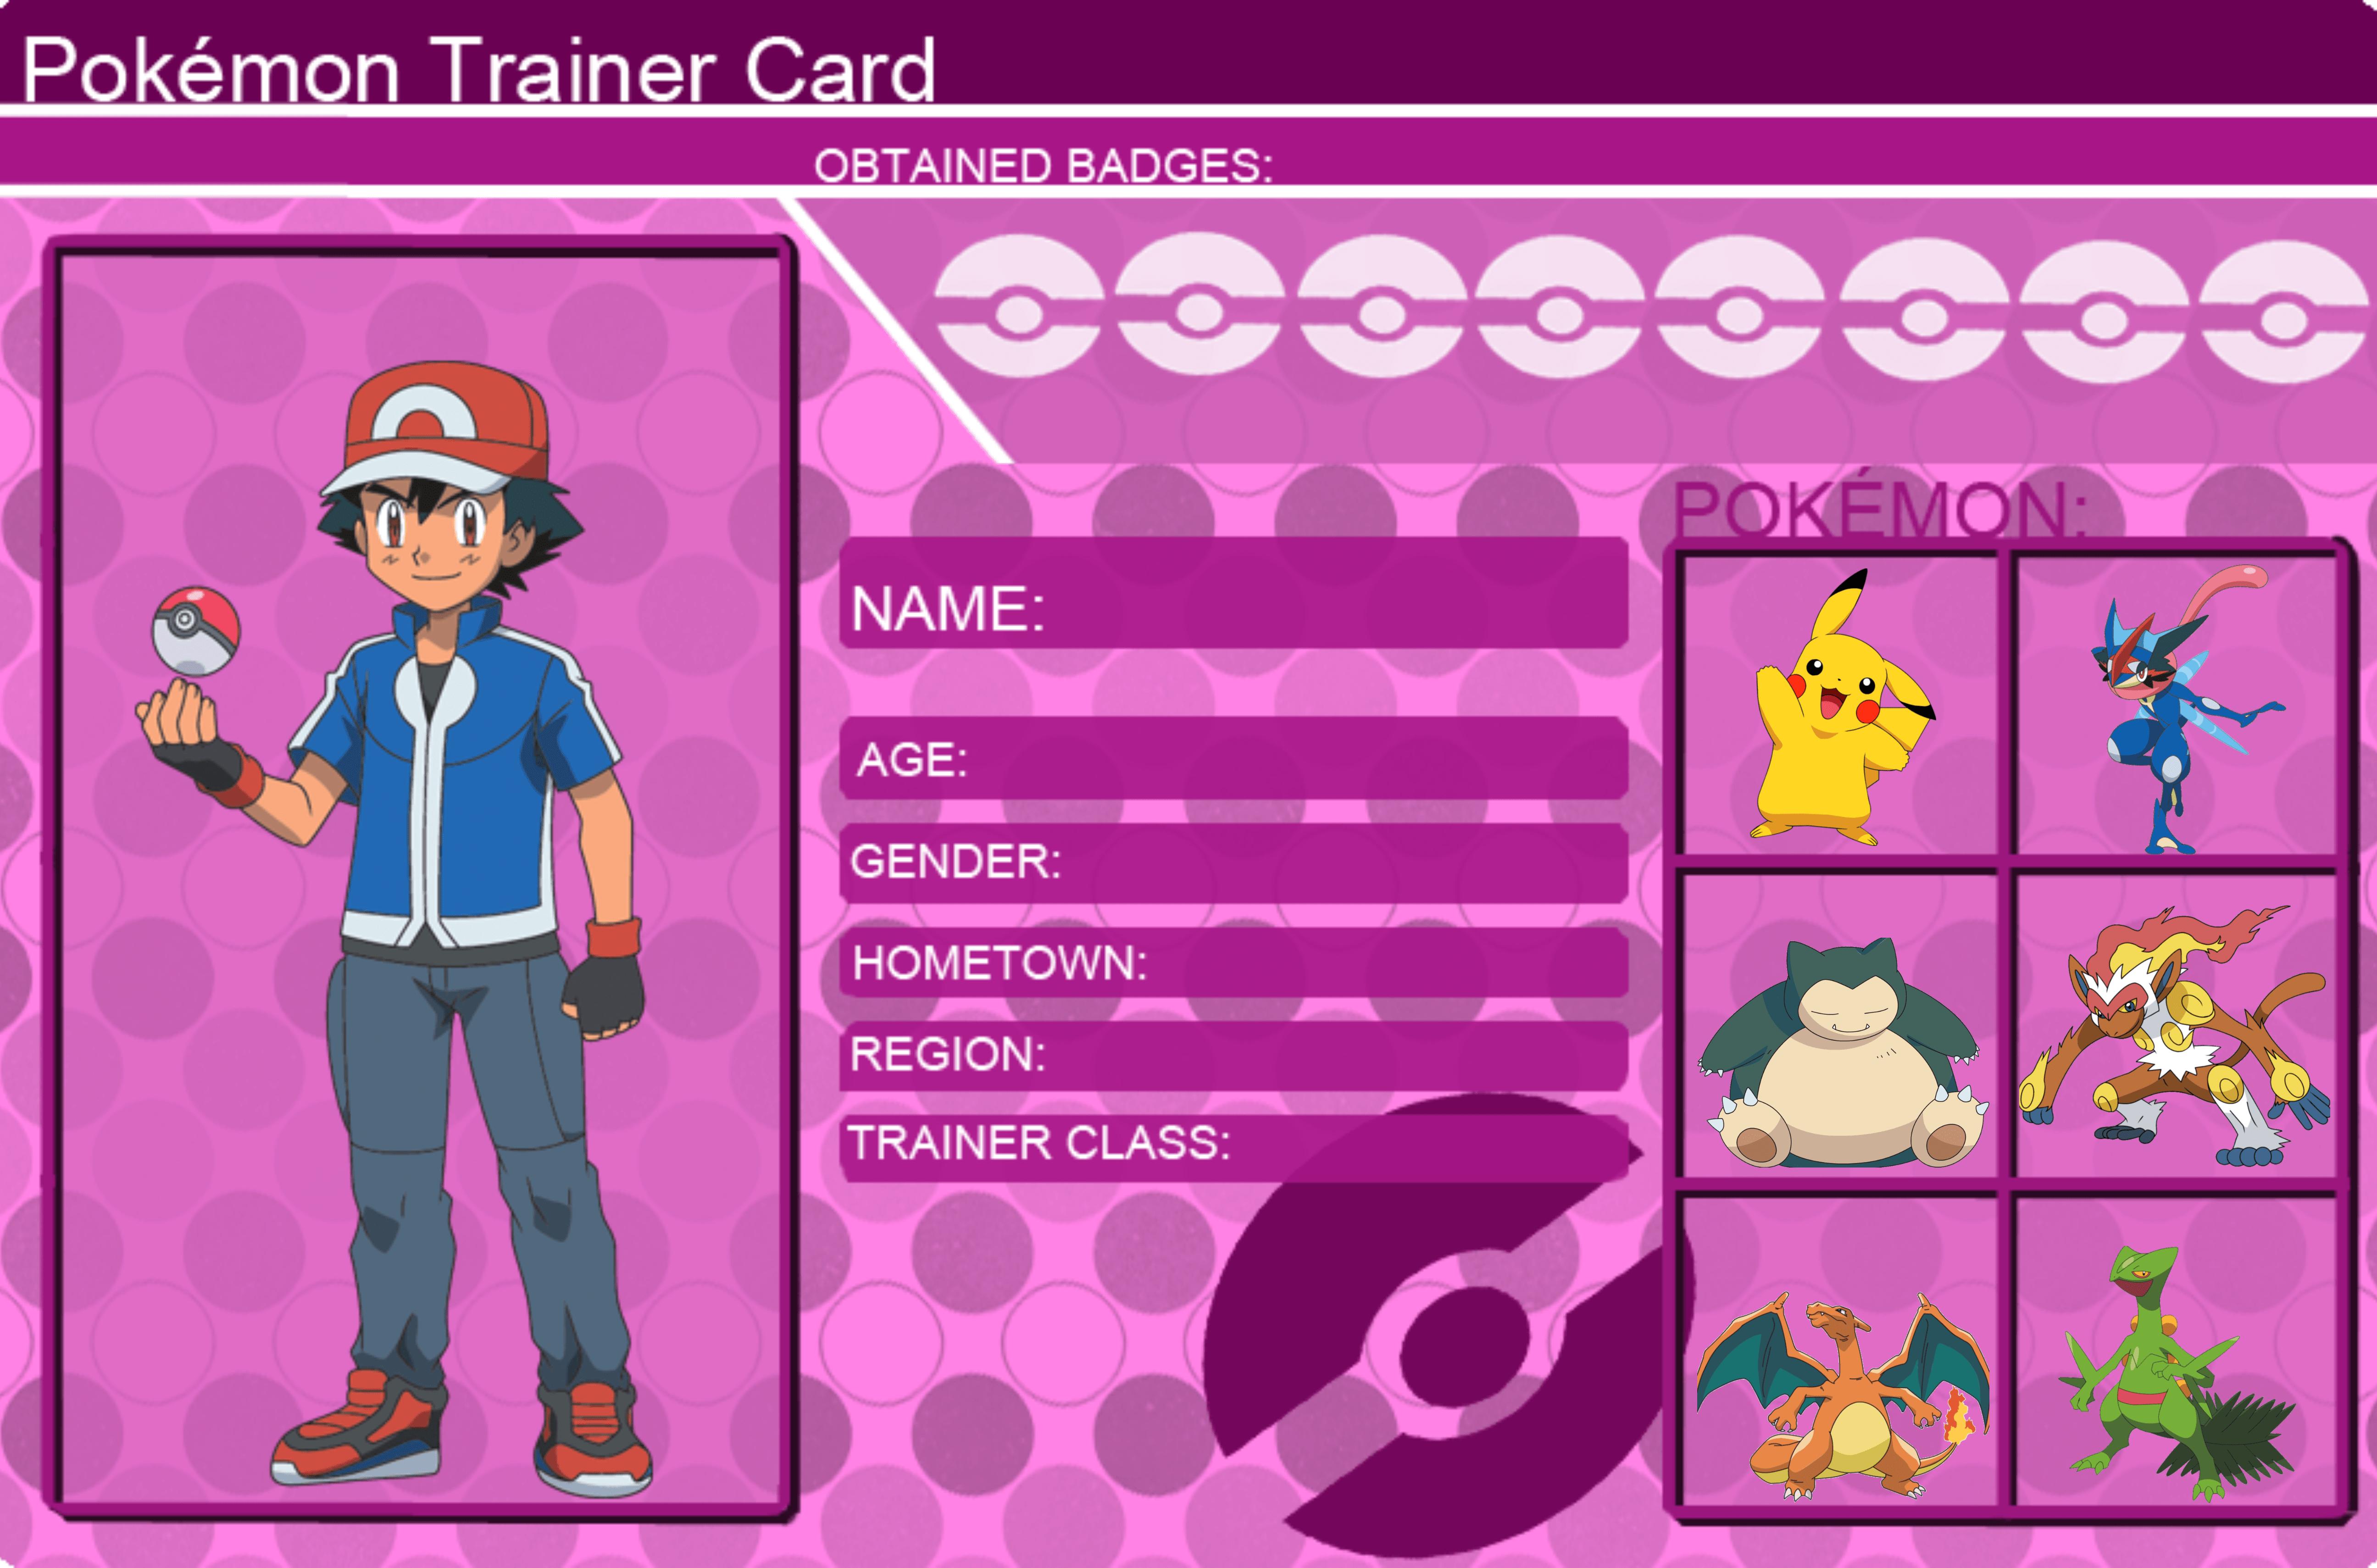 Rine › Pokemon Ash trainer card